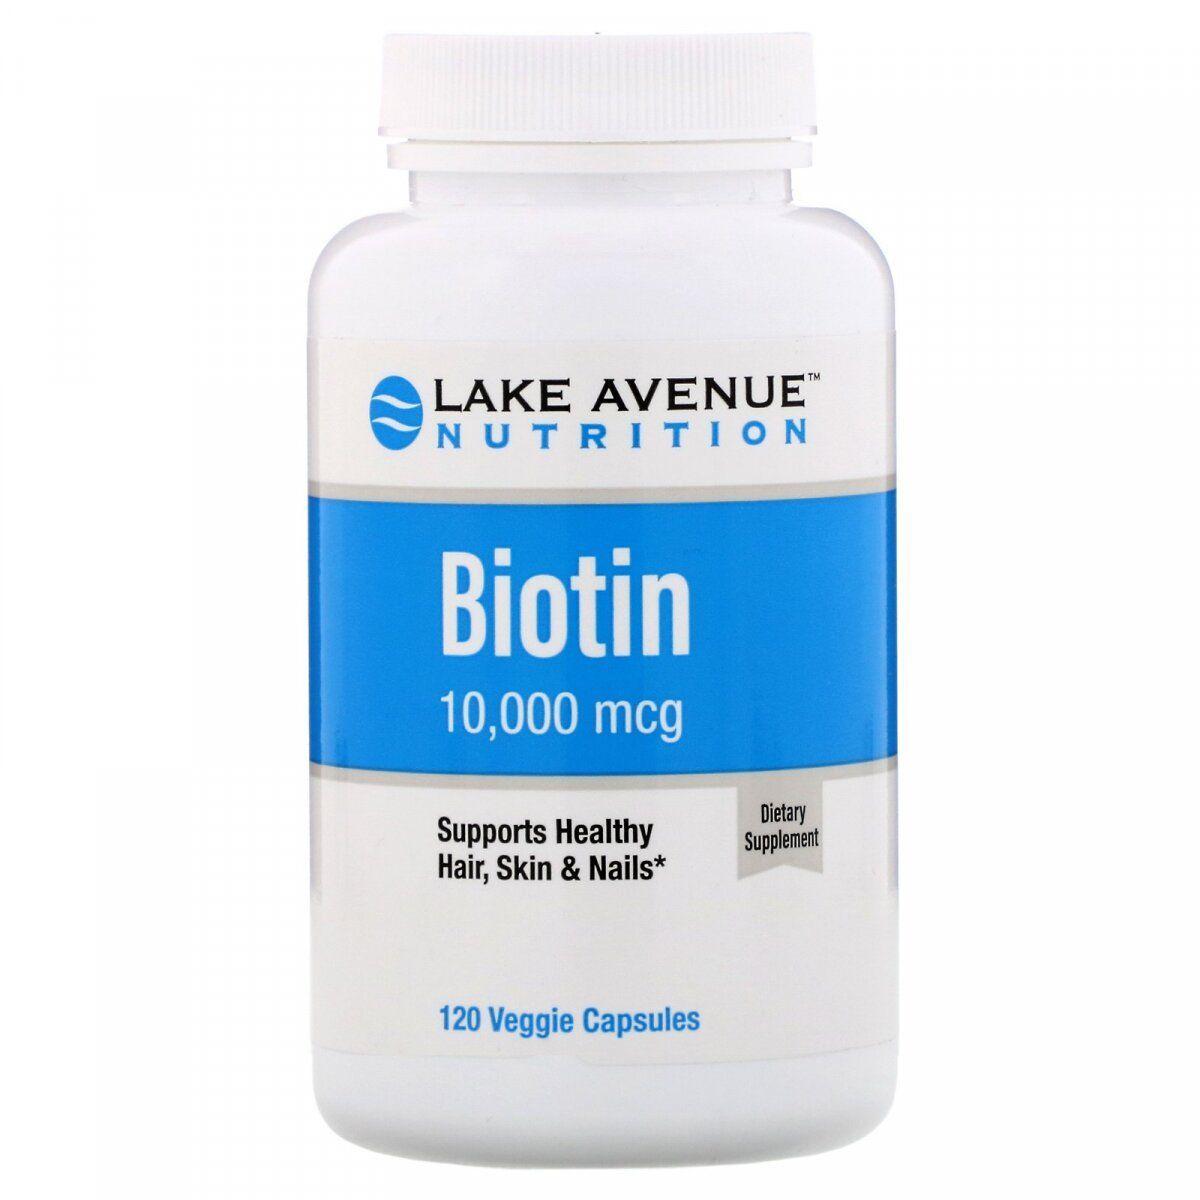 Lake Avenue Biotin 10,000 mcg 120 Veg Caps